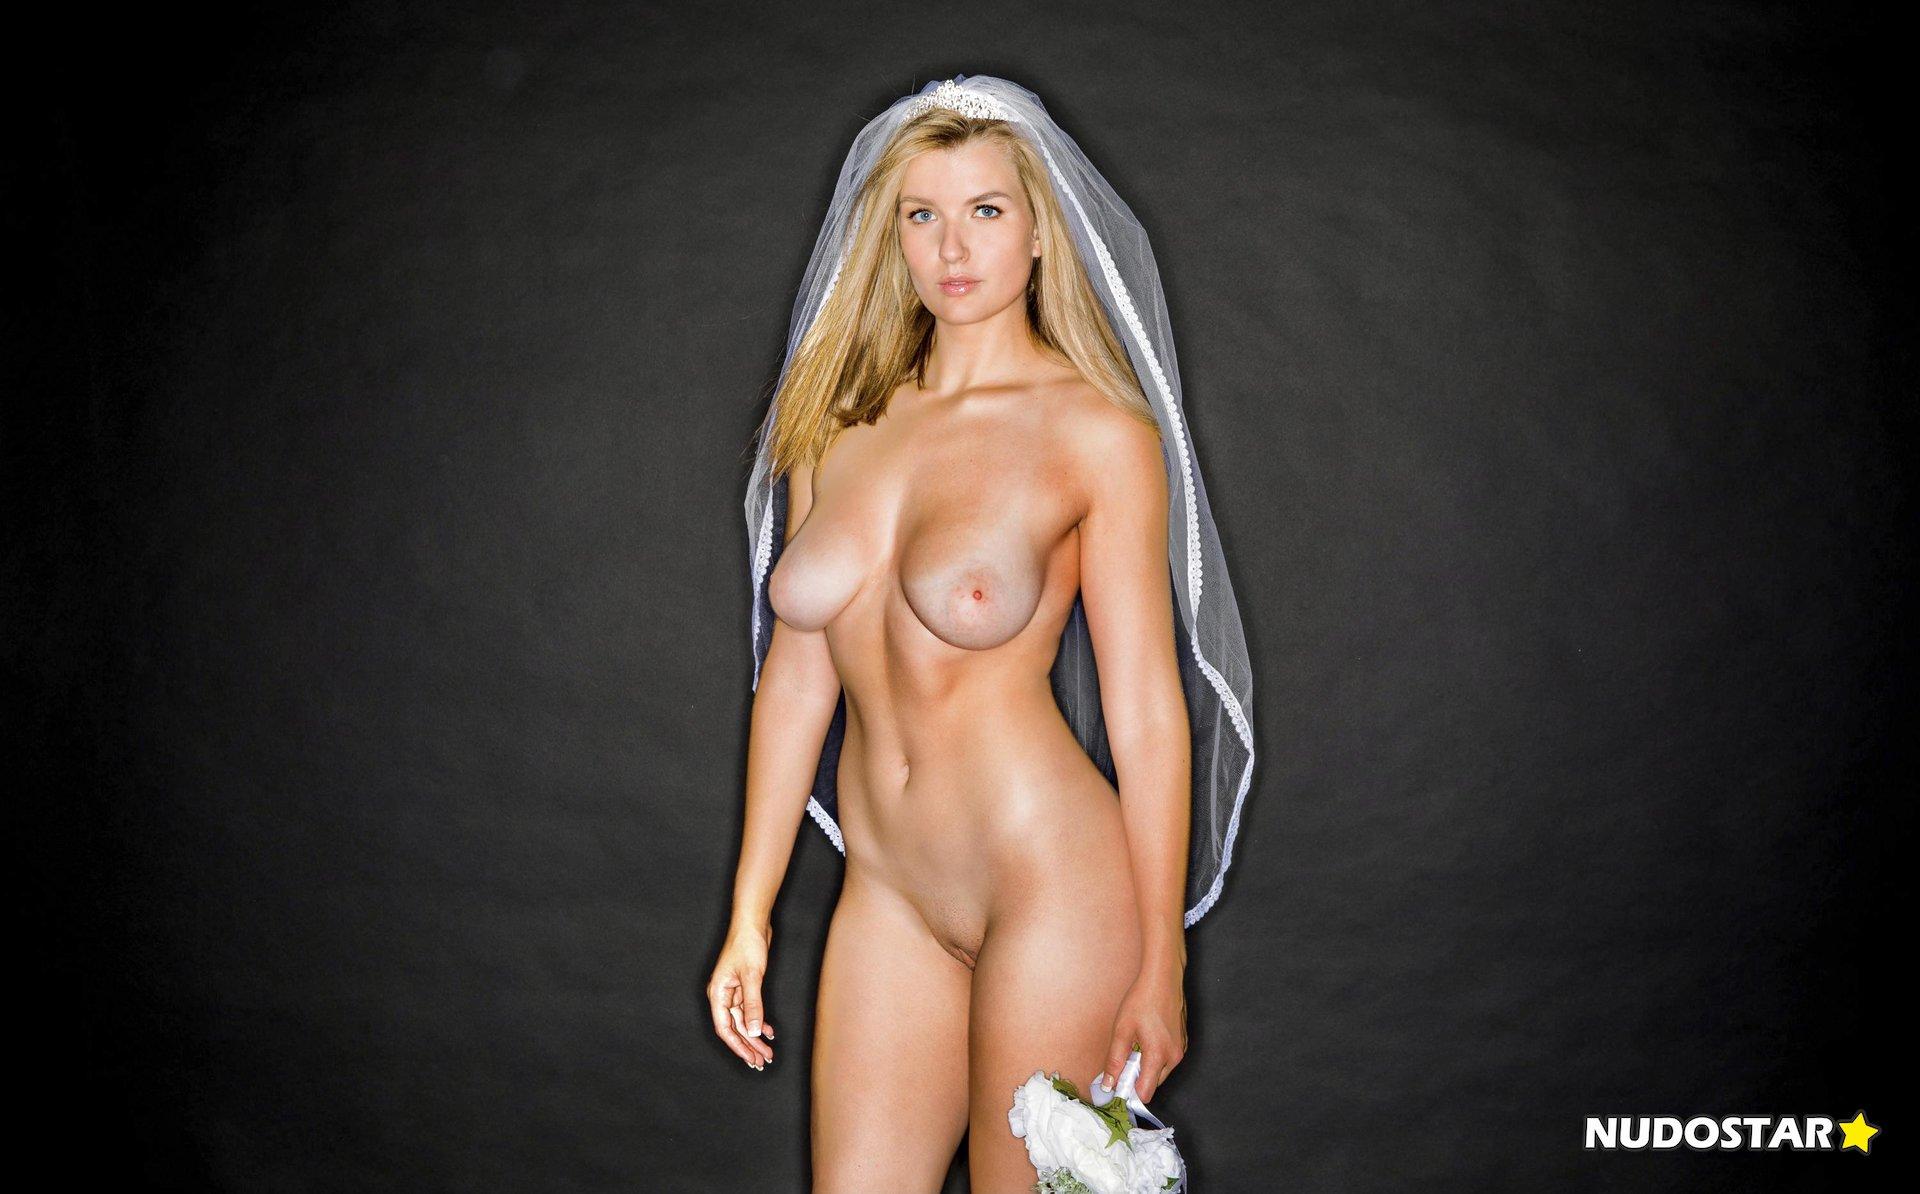 Mia Melano Miamelano777 Onlyfans Nude Leaks 0029